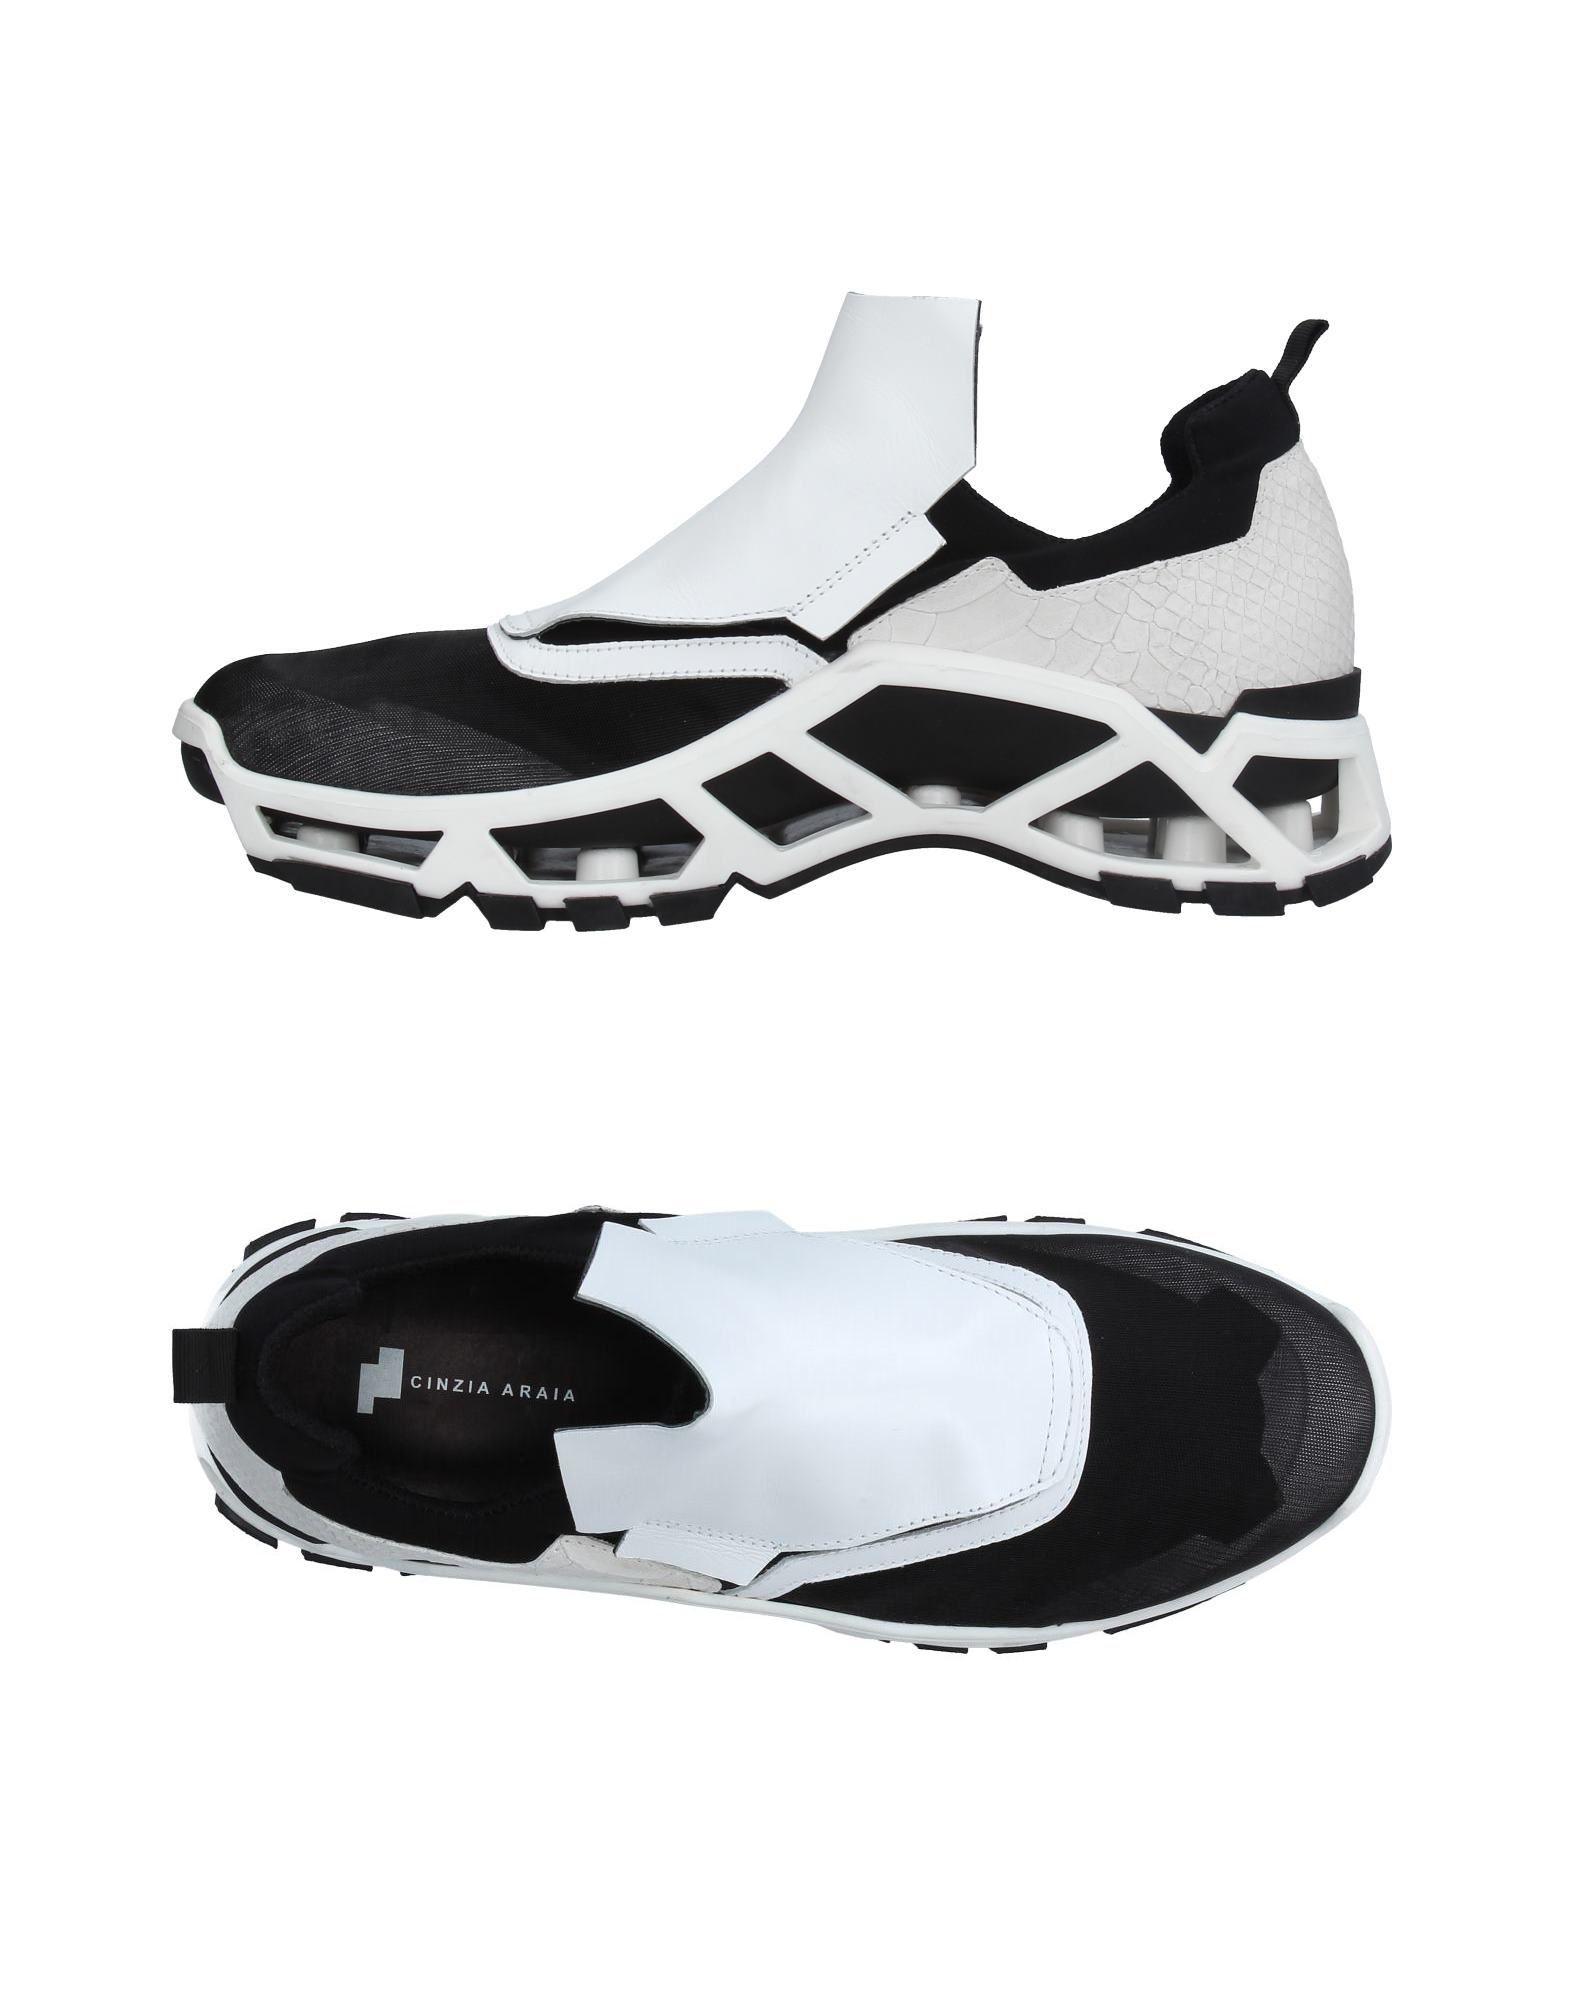 Cinzia Araia Sneakers - Men Cinzia Araia Sneakers online on 11226194AK  United Kingdom - 11226194AK on cdbdbb